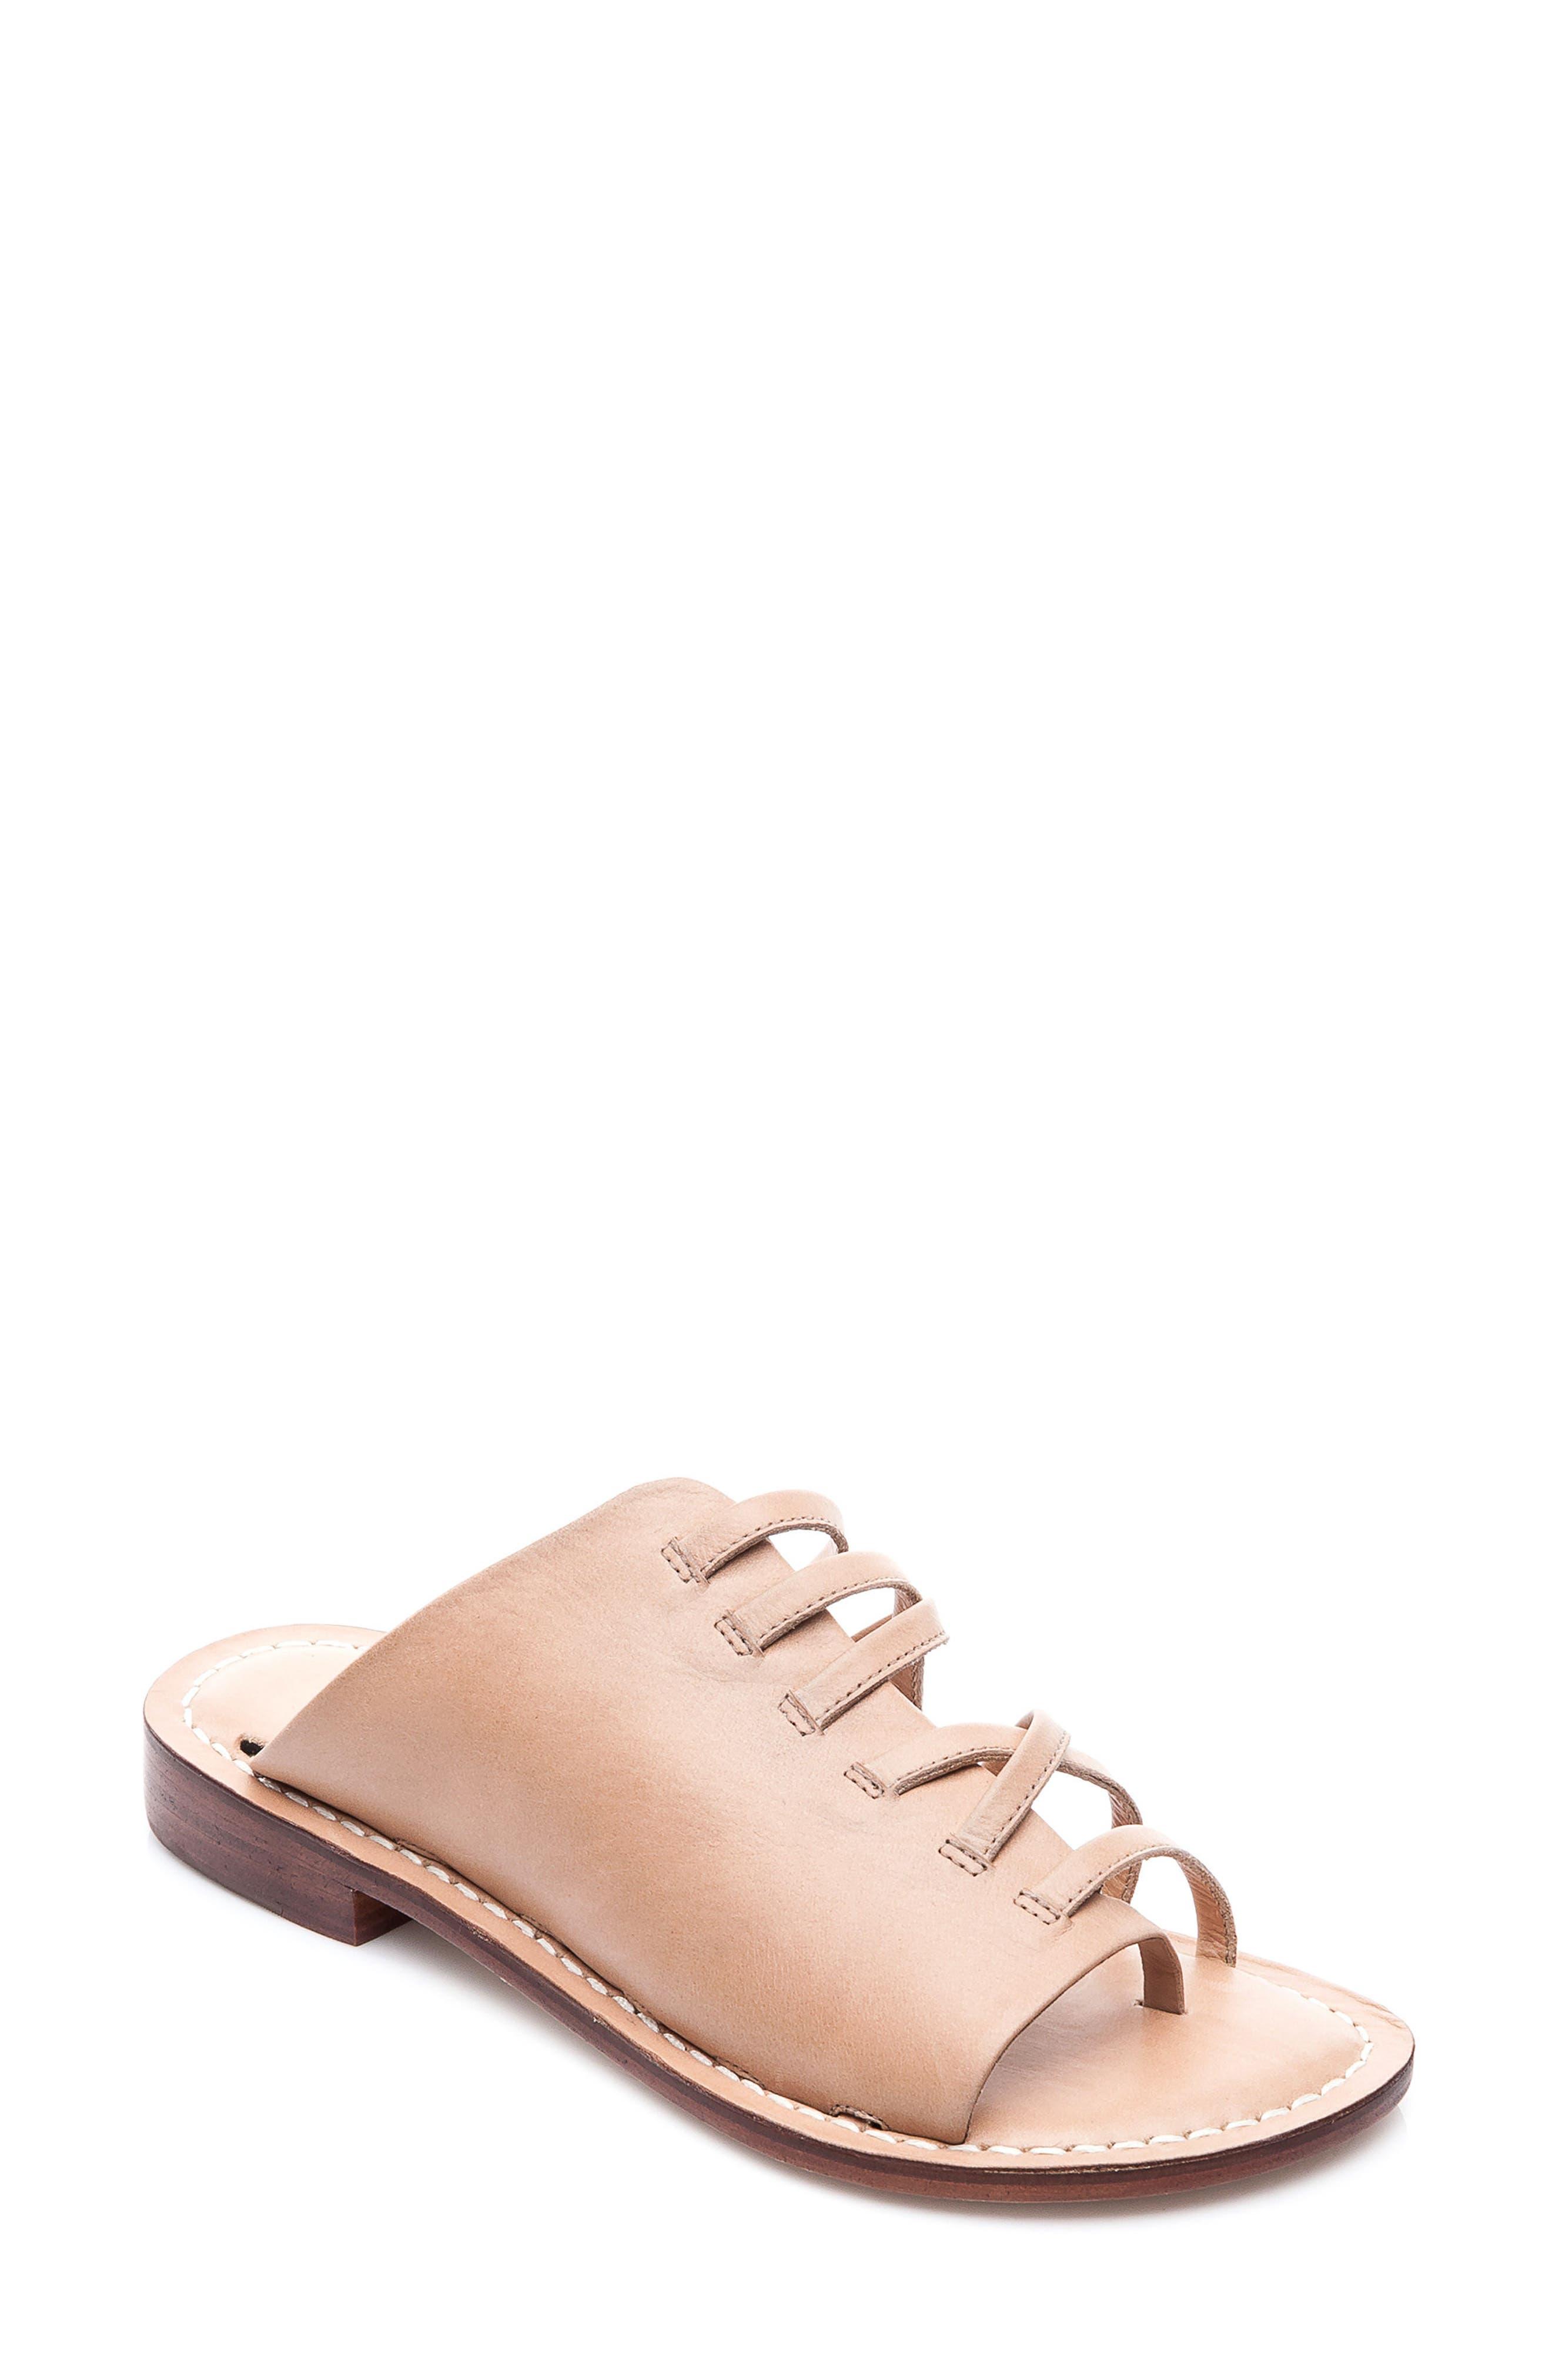 Bernardo Tori Slide Sandal,                         Main,                         color, Light Camel Leather